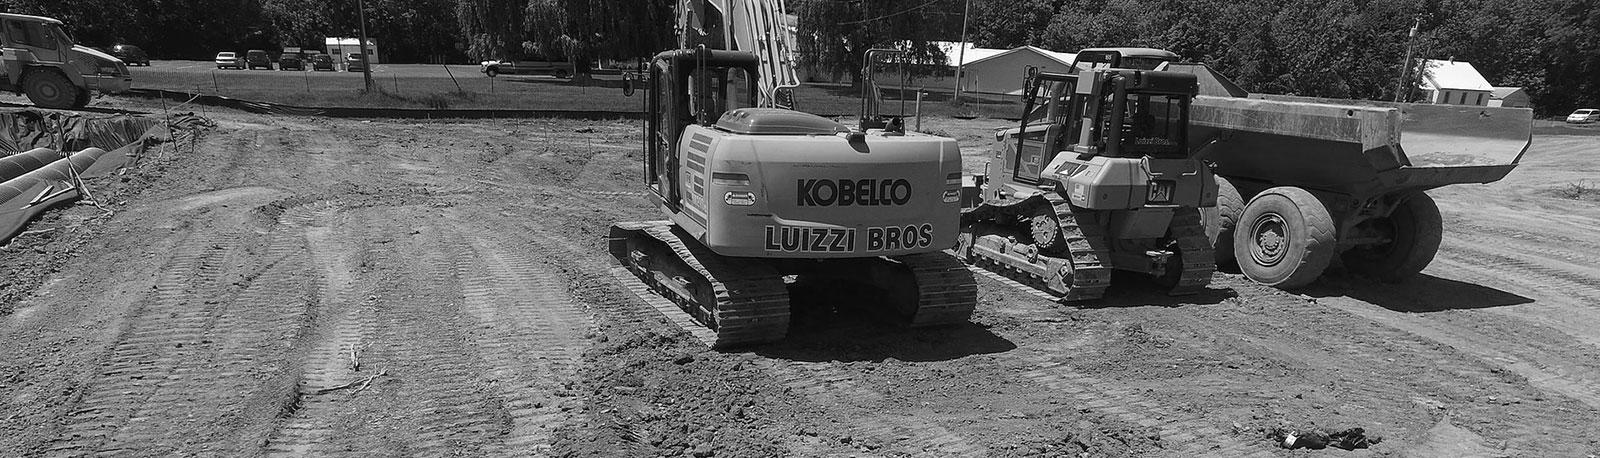 Luizzi Bros Excavation Equipment on a job site